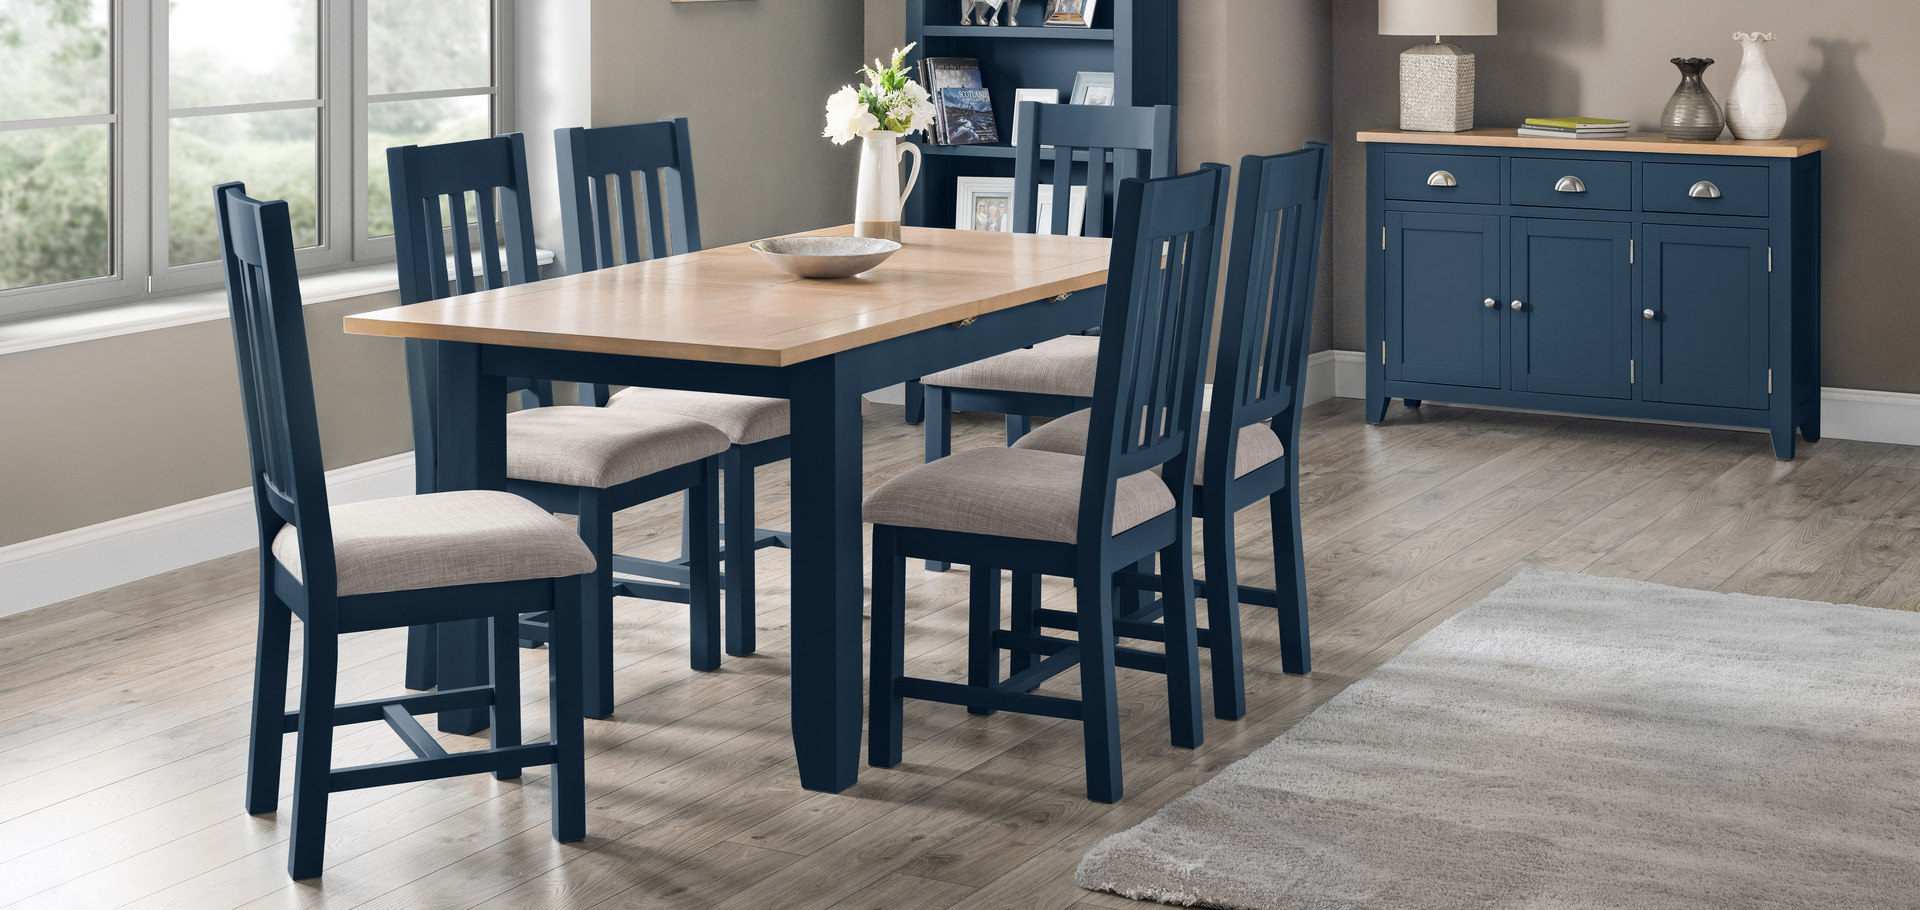 0131b7a269 Julian Bowen Limited | Furniture